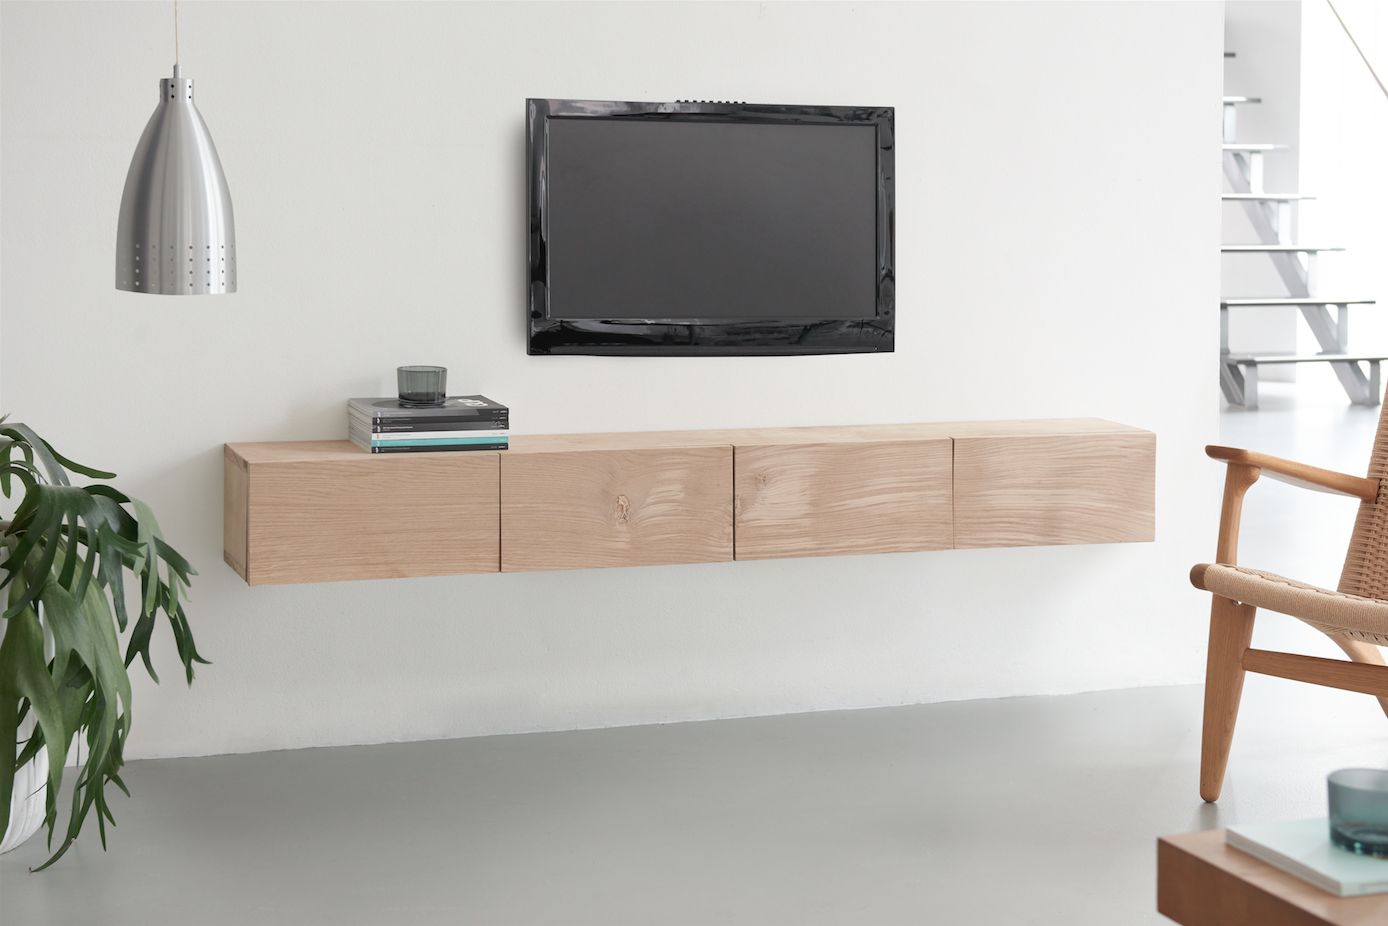 Tv Meubel Wieltjes : Tv meubel steigerbuis firma hout staal